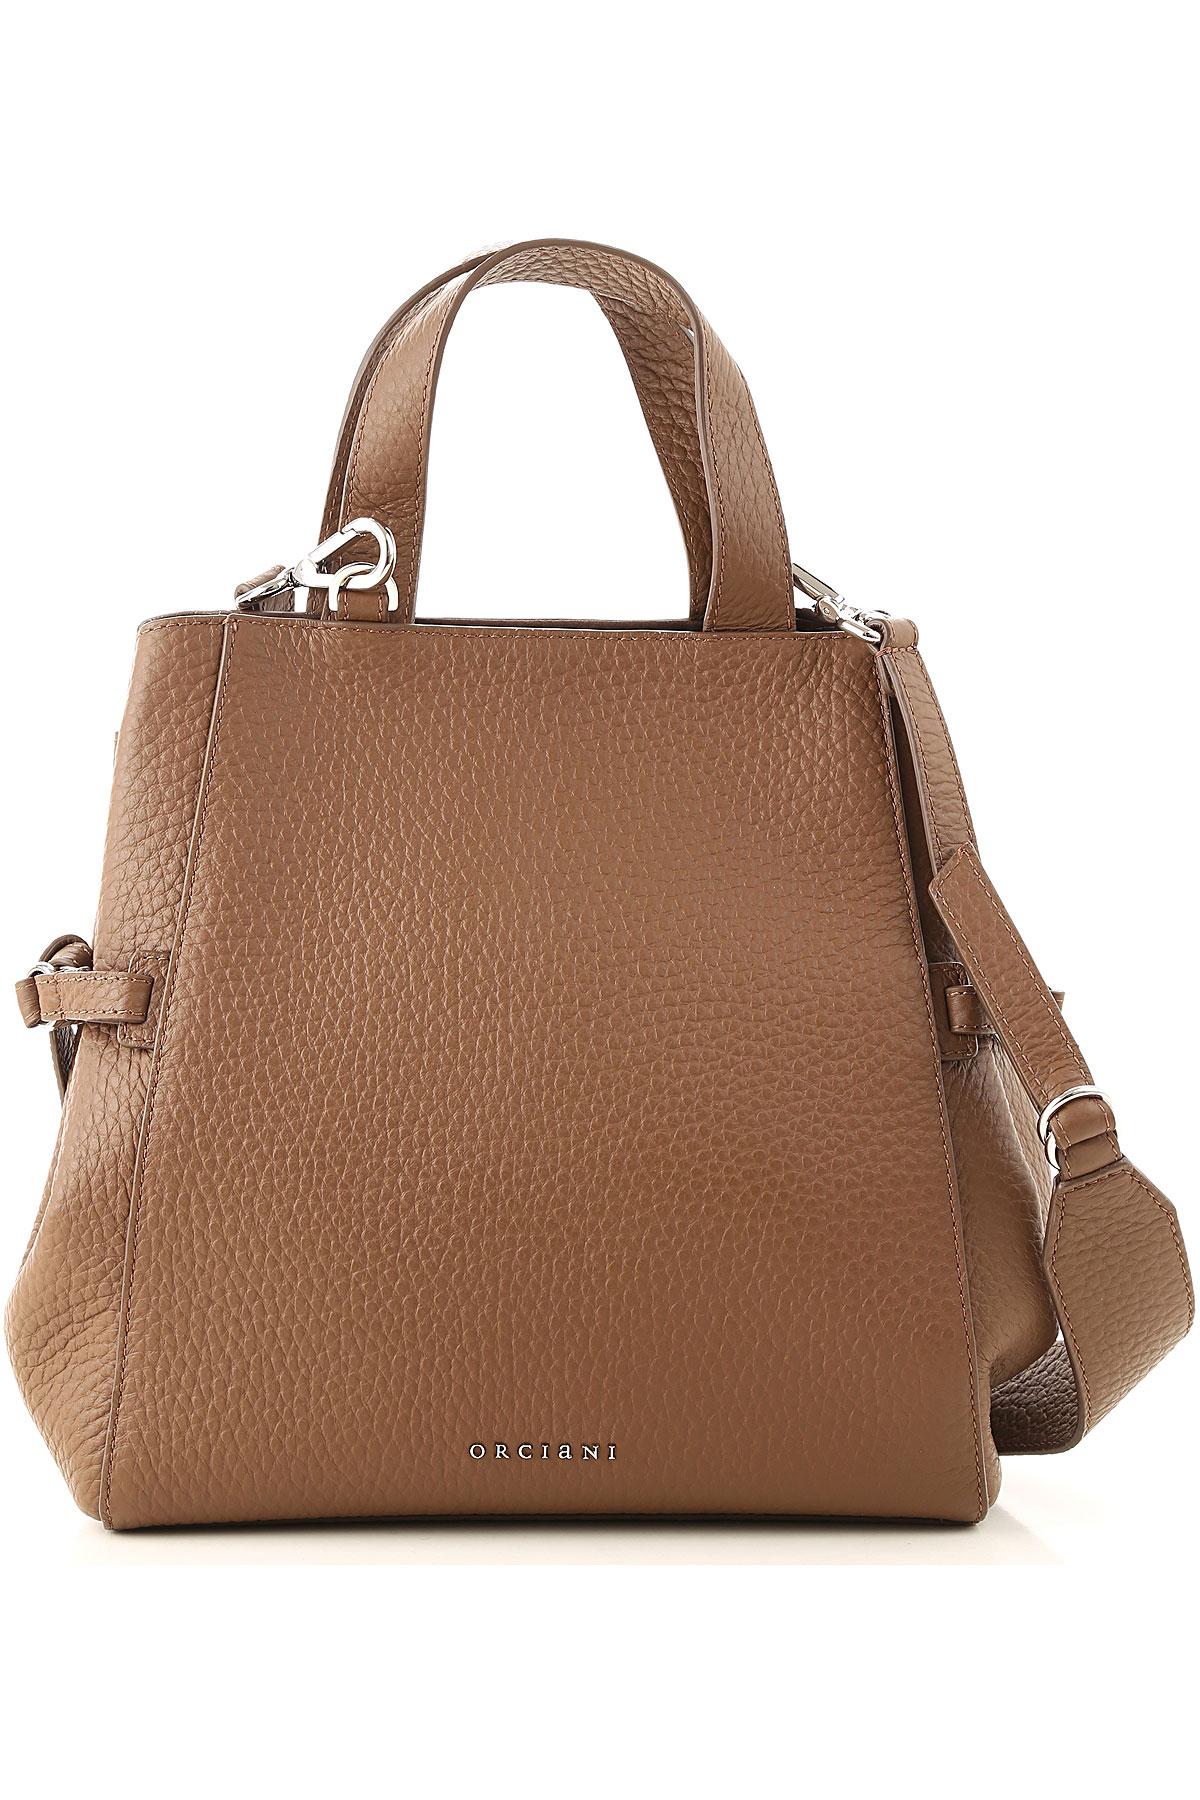 Orciani Top Handle Handbag On Sale, Caramel, Leather, 2019